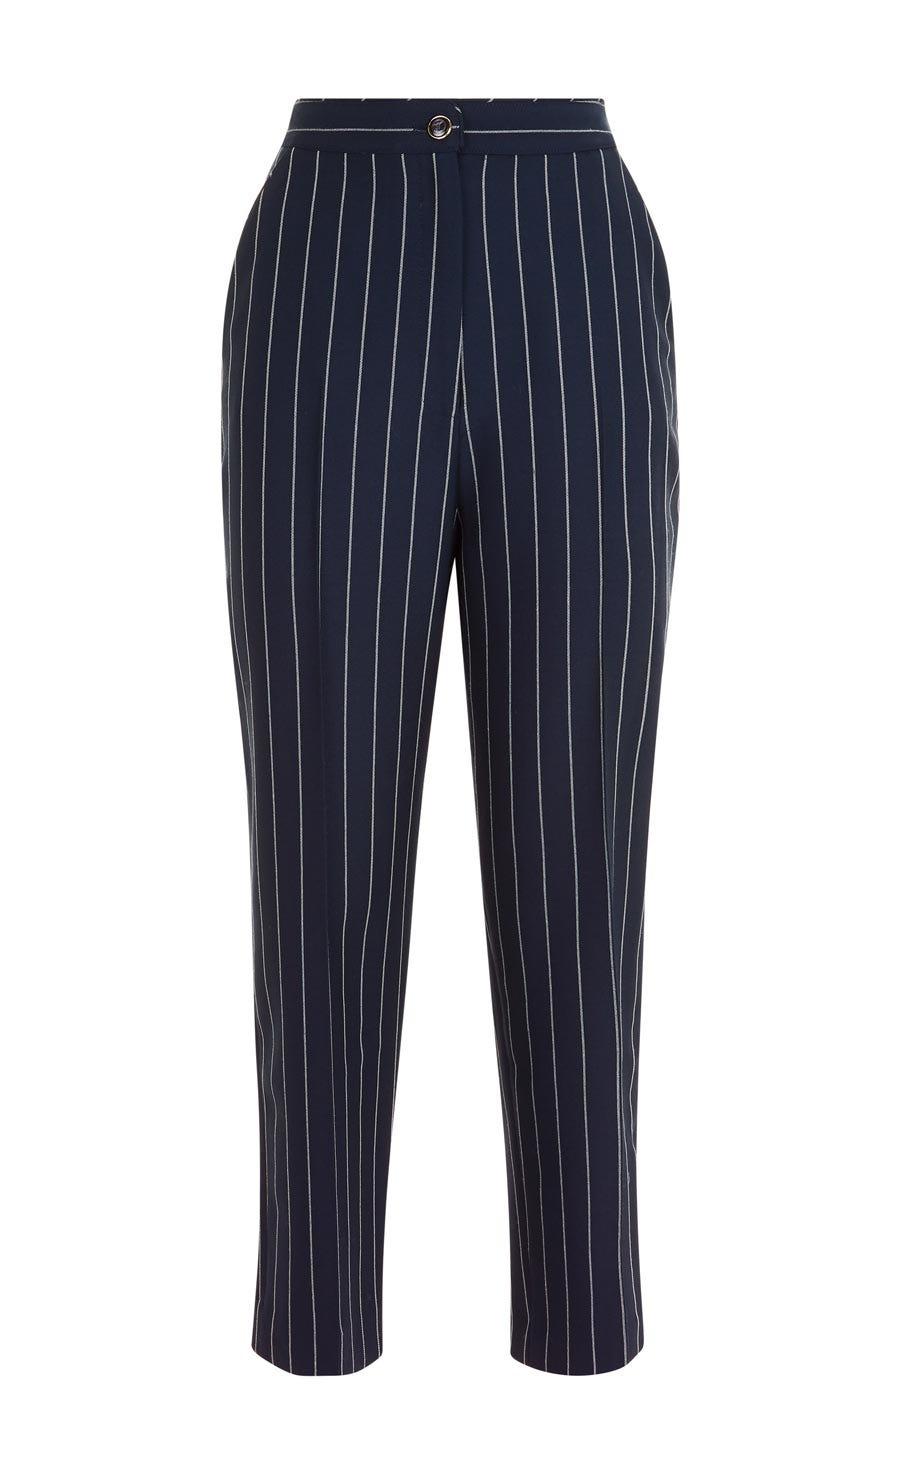 Francesca Tailored Trouser